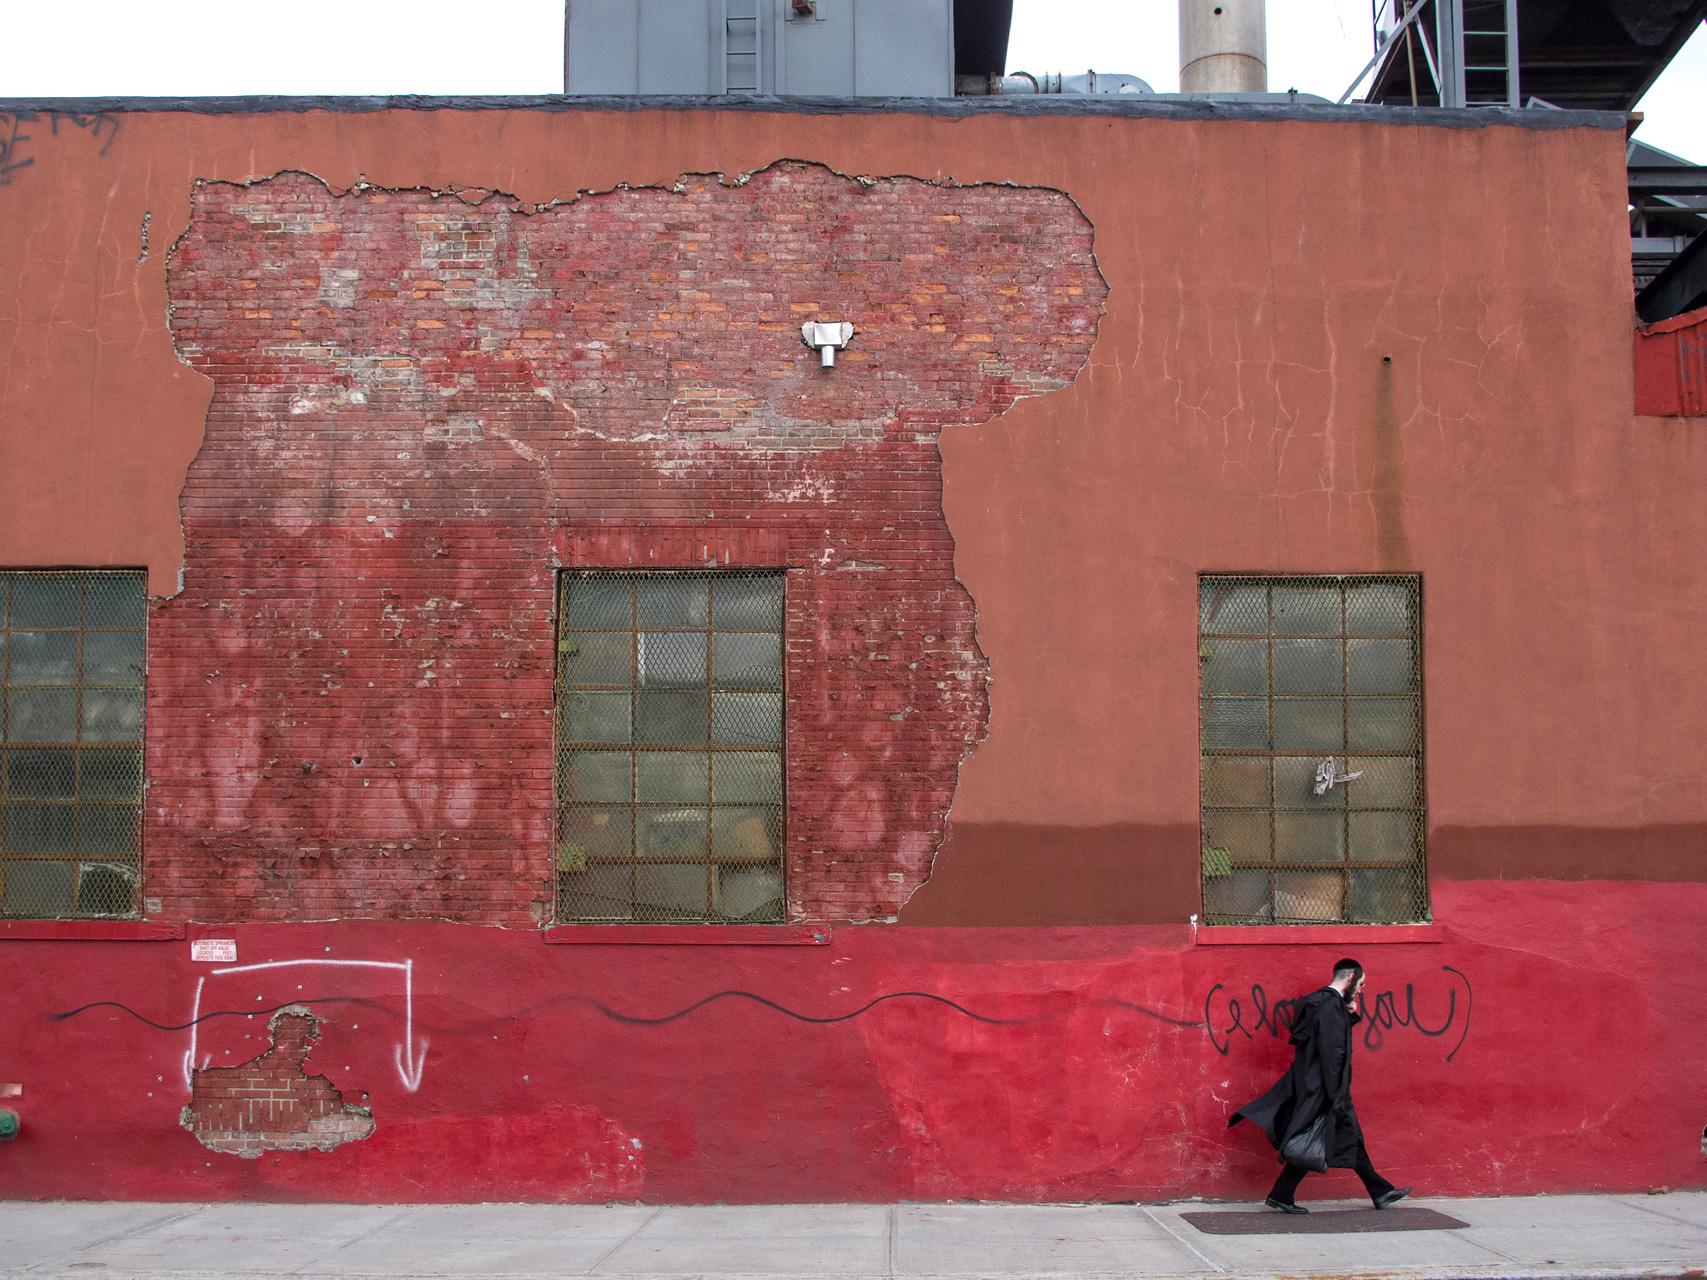 Richard Koek - Kent Avenue, Brooklyn - Courtesy Eduard Planting Gallery